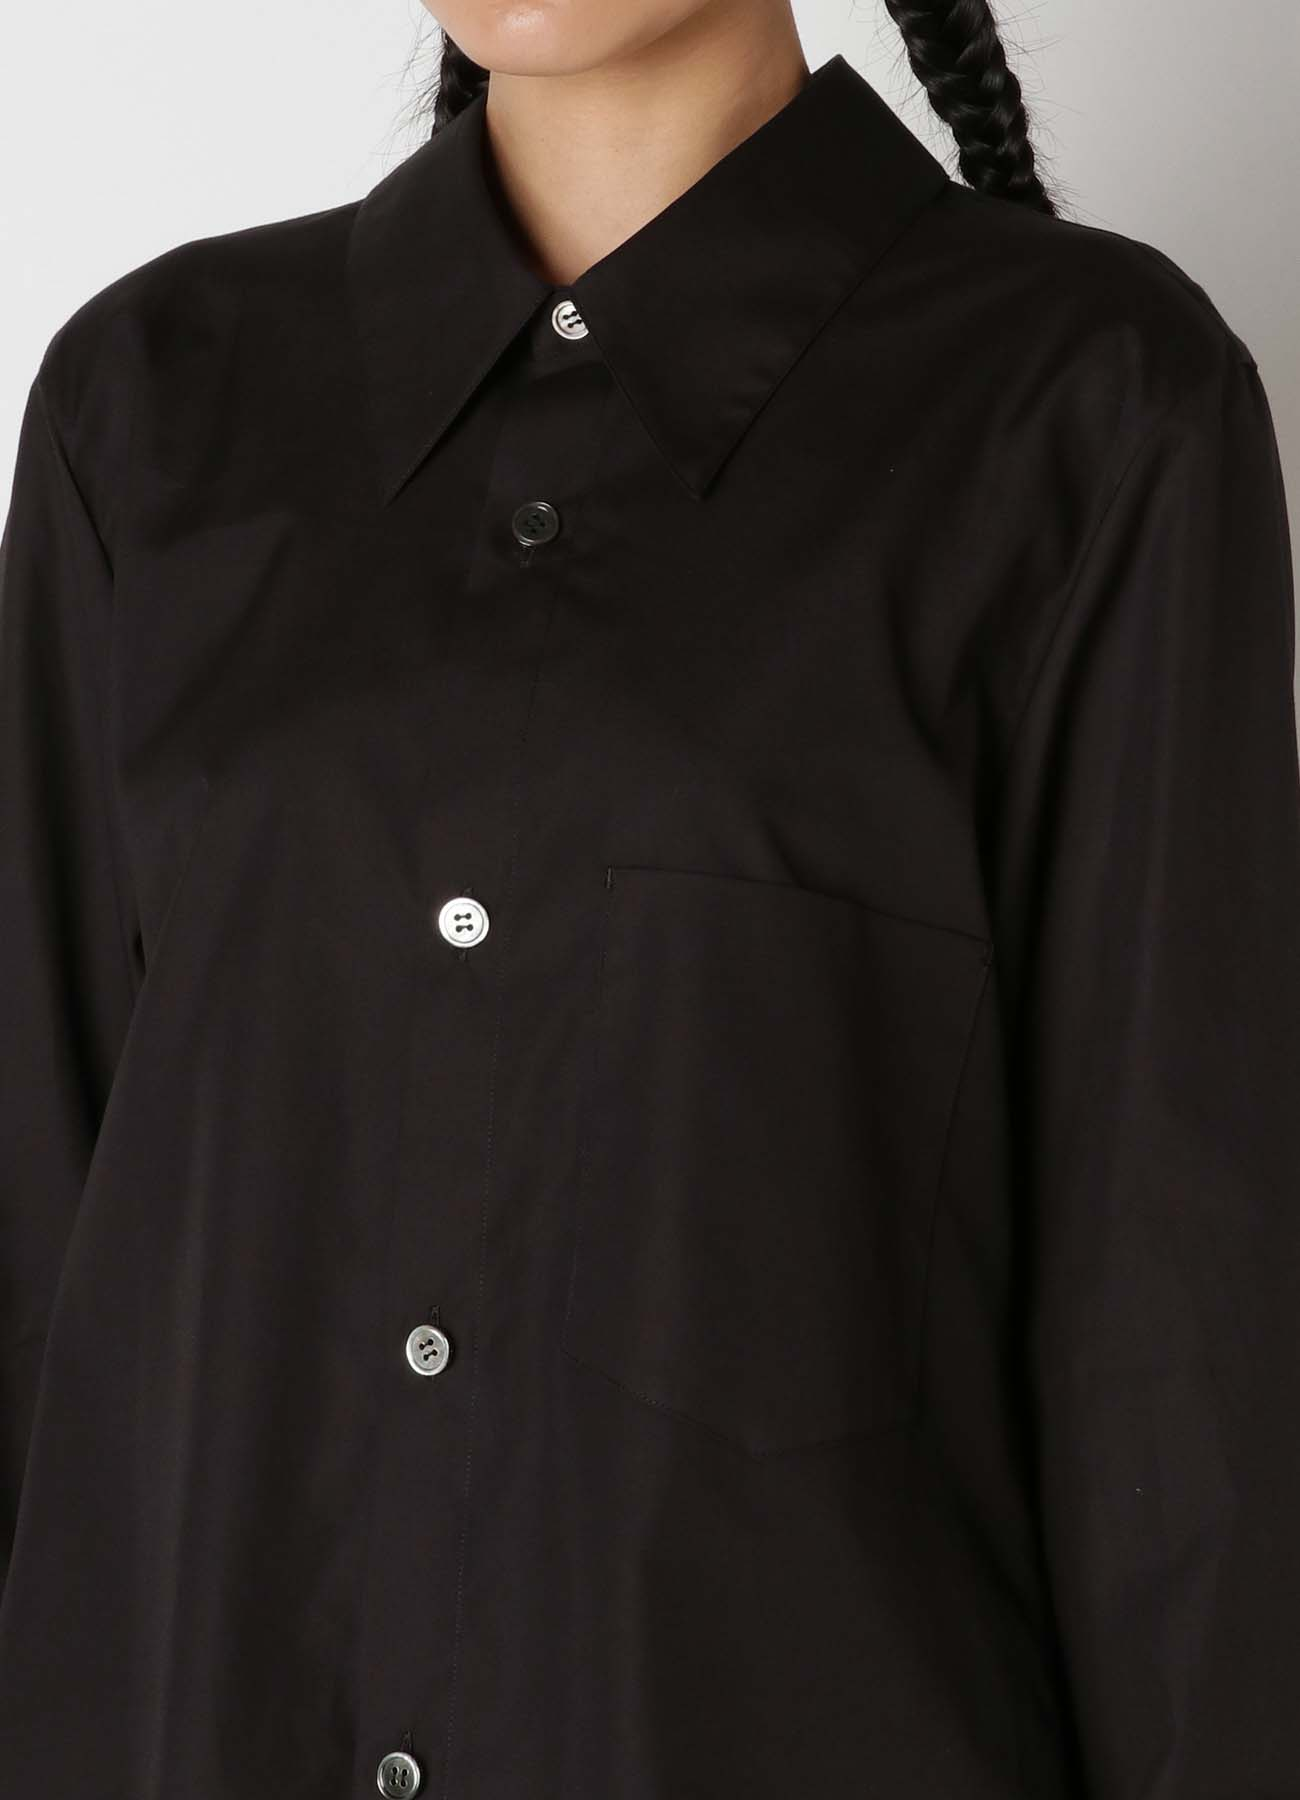 100/2 Broad B Back Slit Shirt